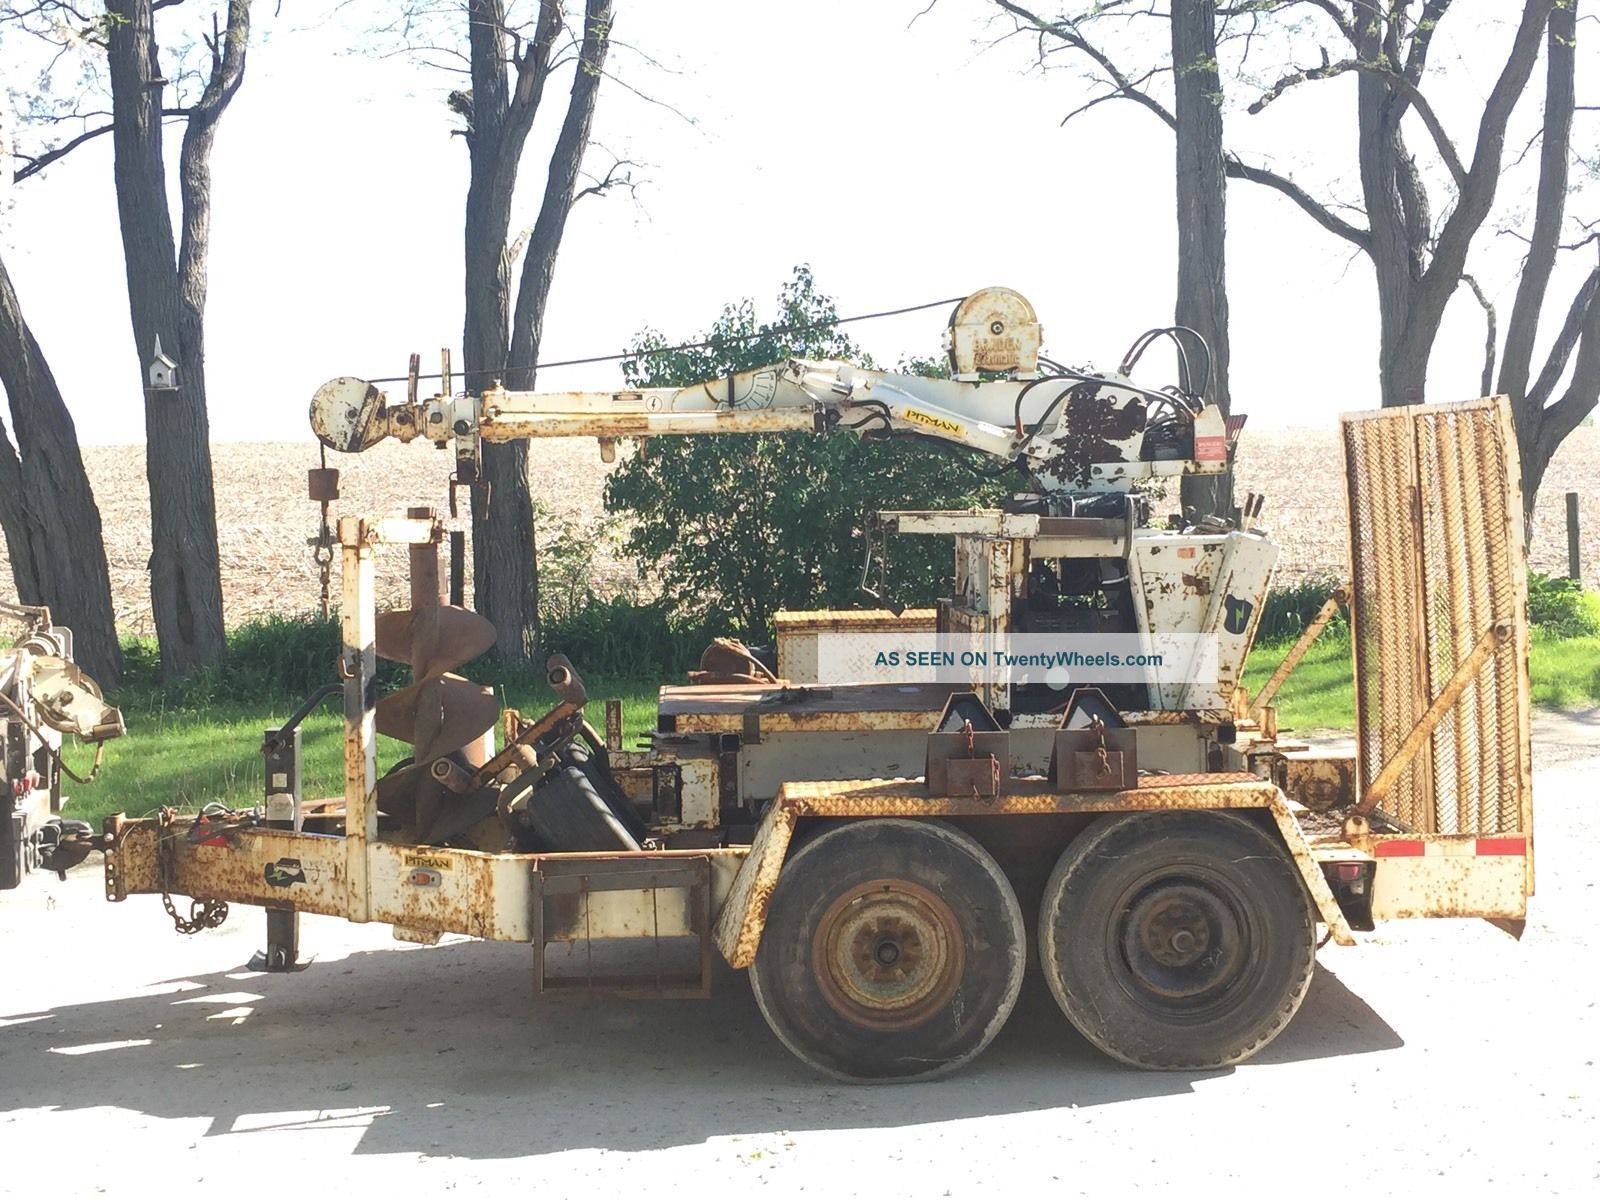 the backyard machine